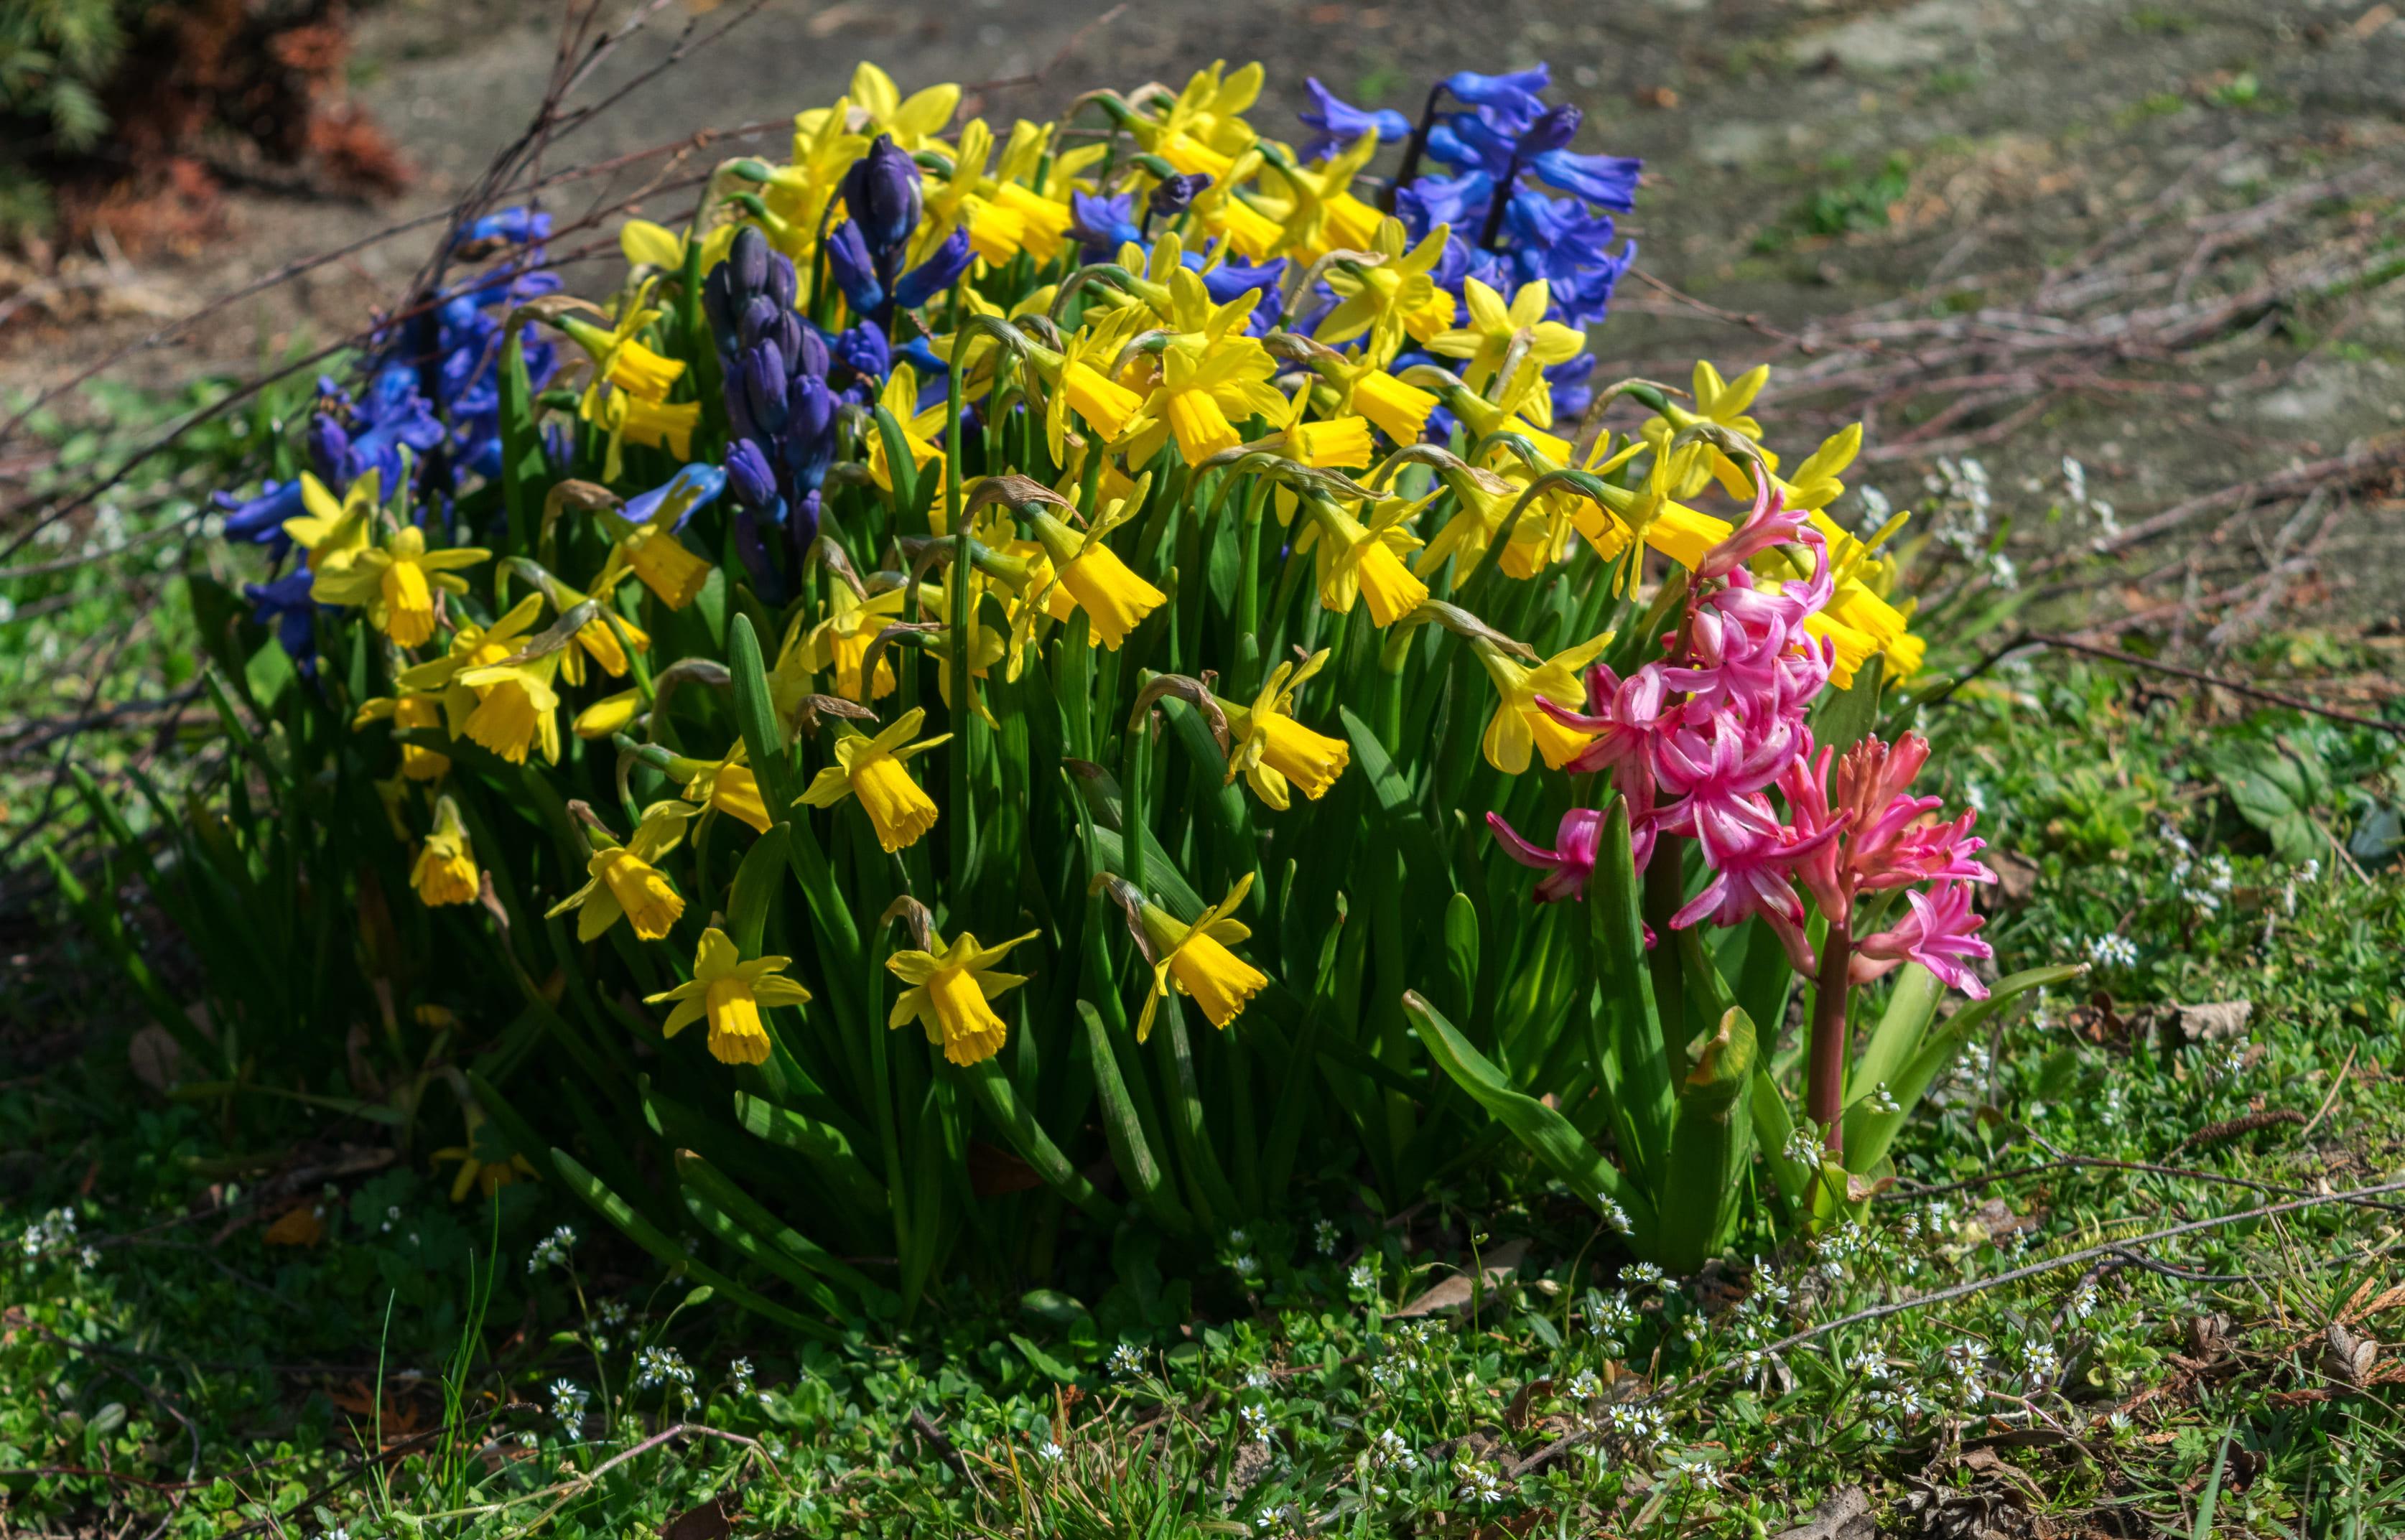 daffodils-photo-57